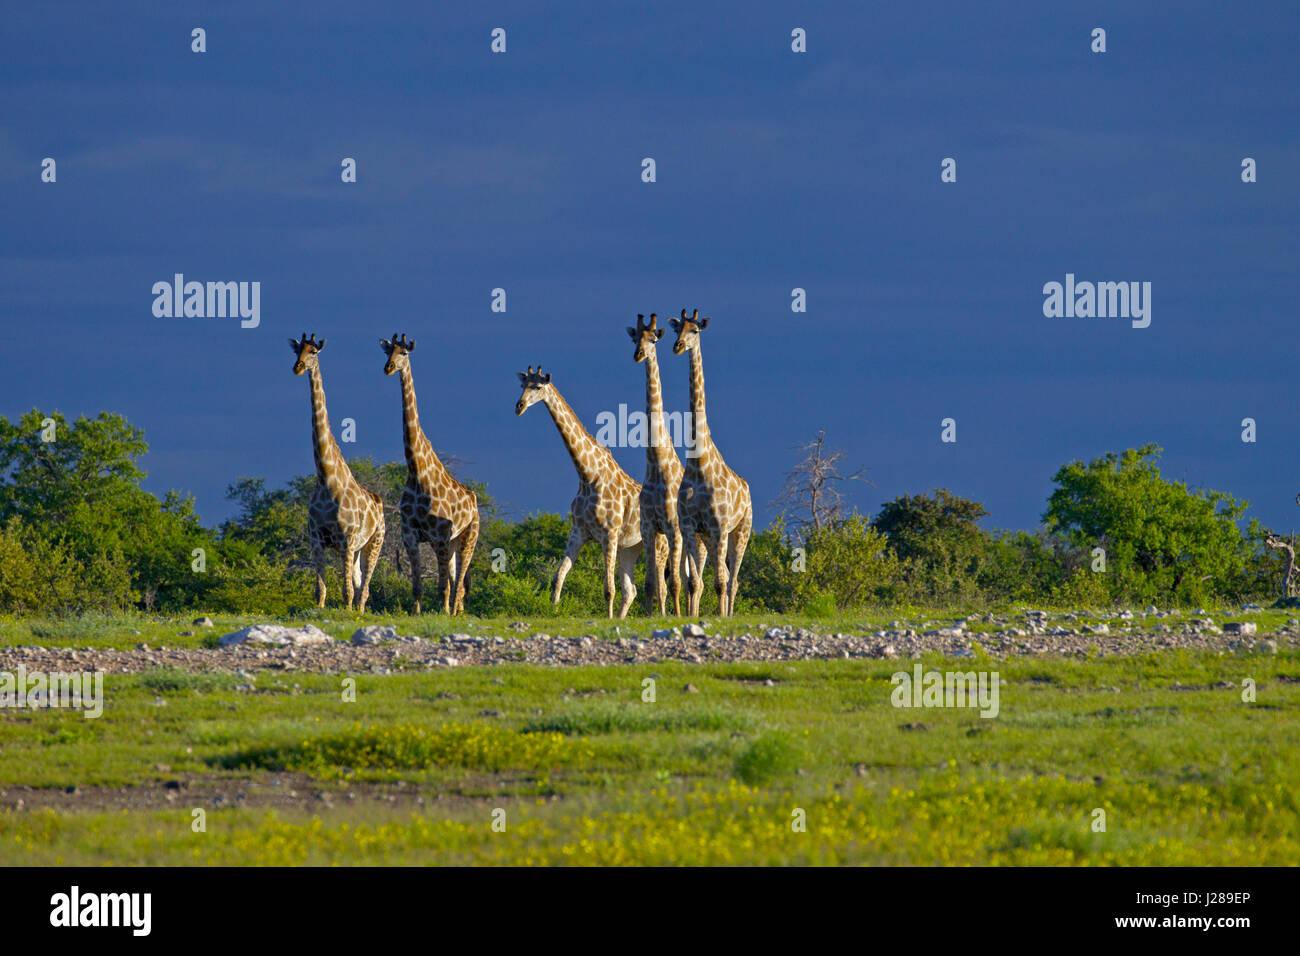 Angolan giraffe Giraffa giraffa angolensis known as Namibian giraffe, is a subspecies of Southern giraffe found - Stock Image